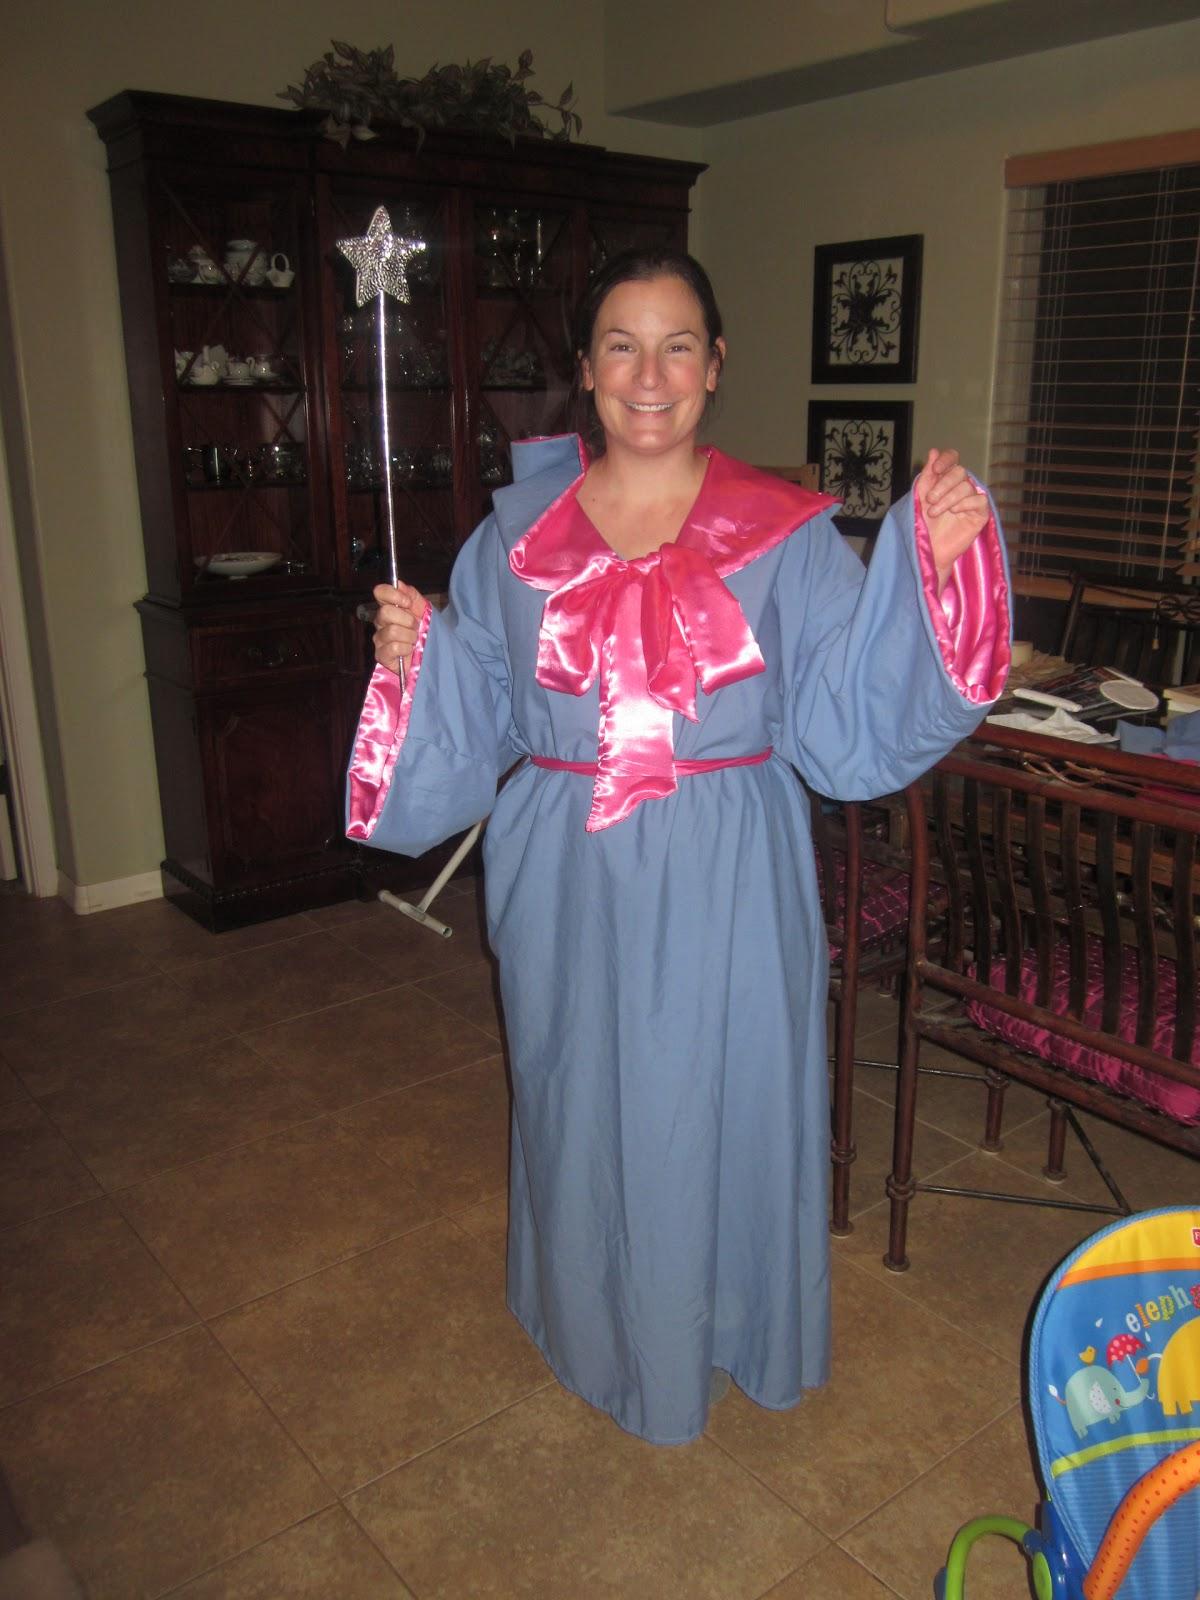 fairy godmother costume eBay